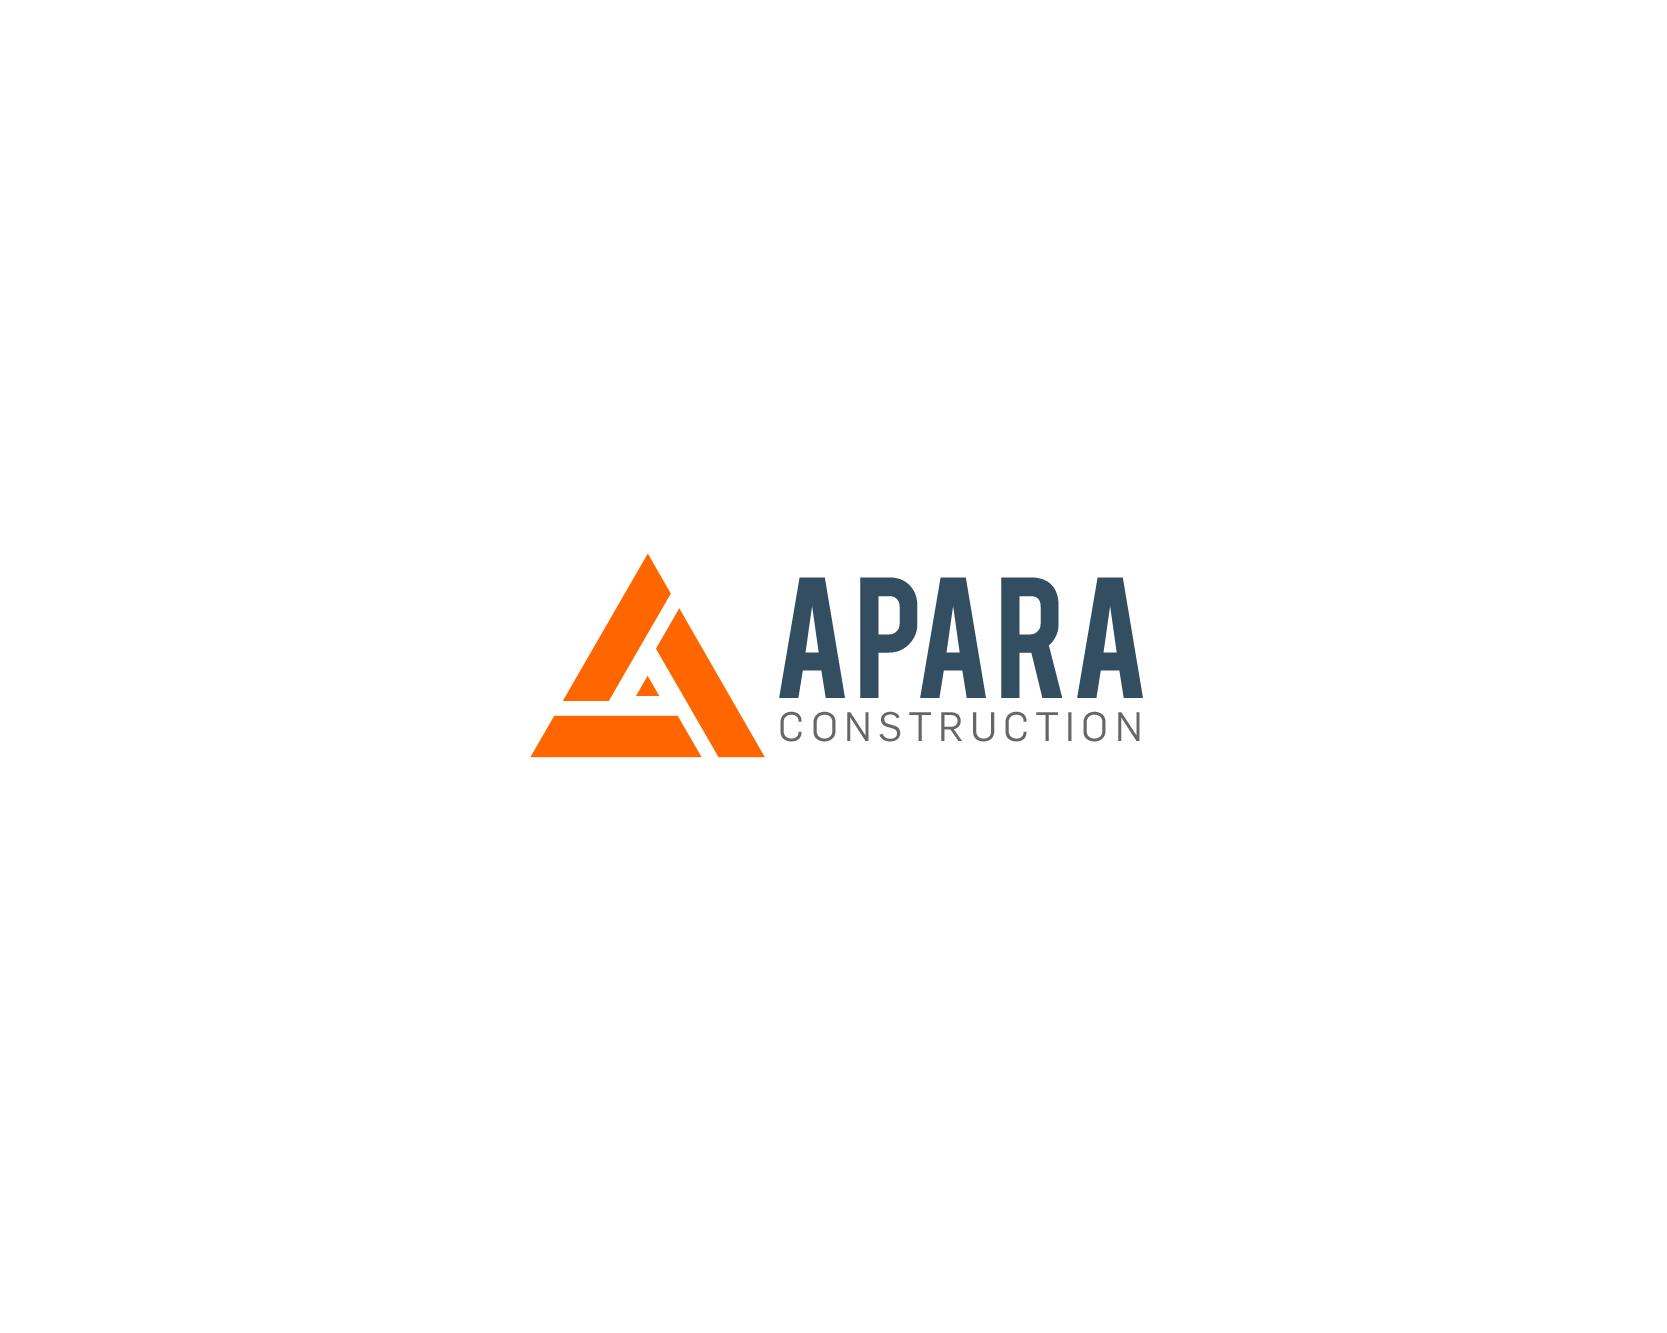 Logo Design by nejikun - Entry No. 102 in the Logo Design Contest Apara Construction Logo Design.